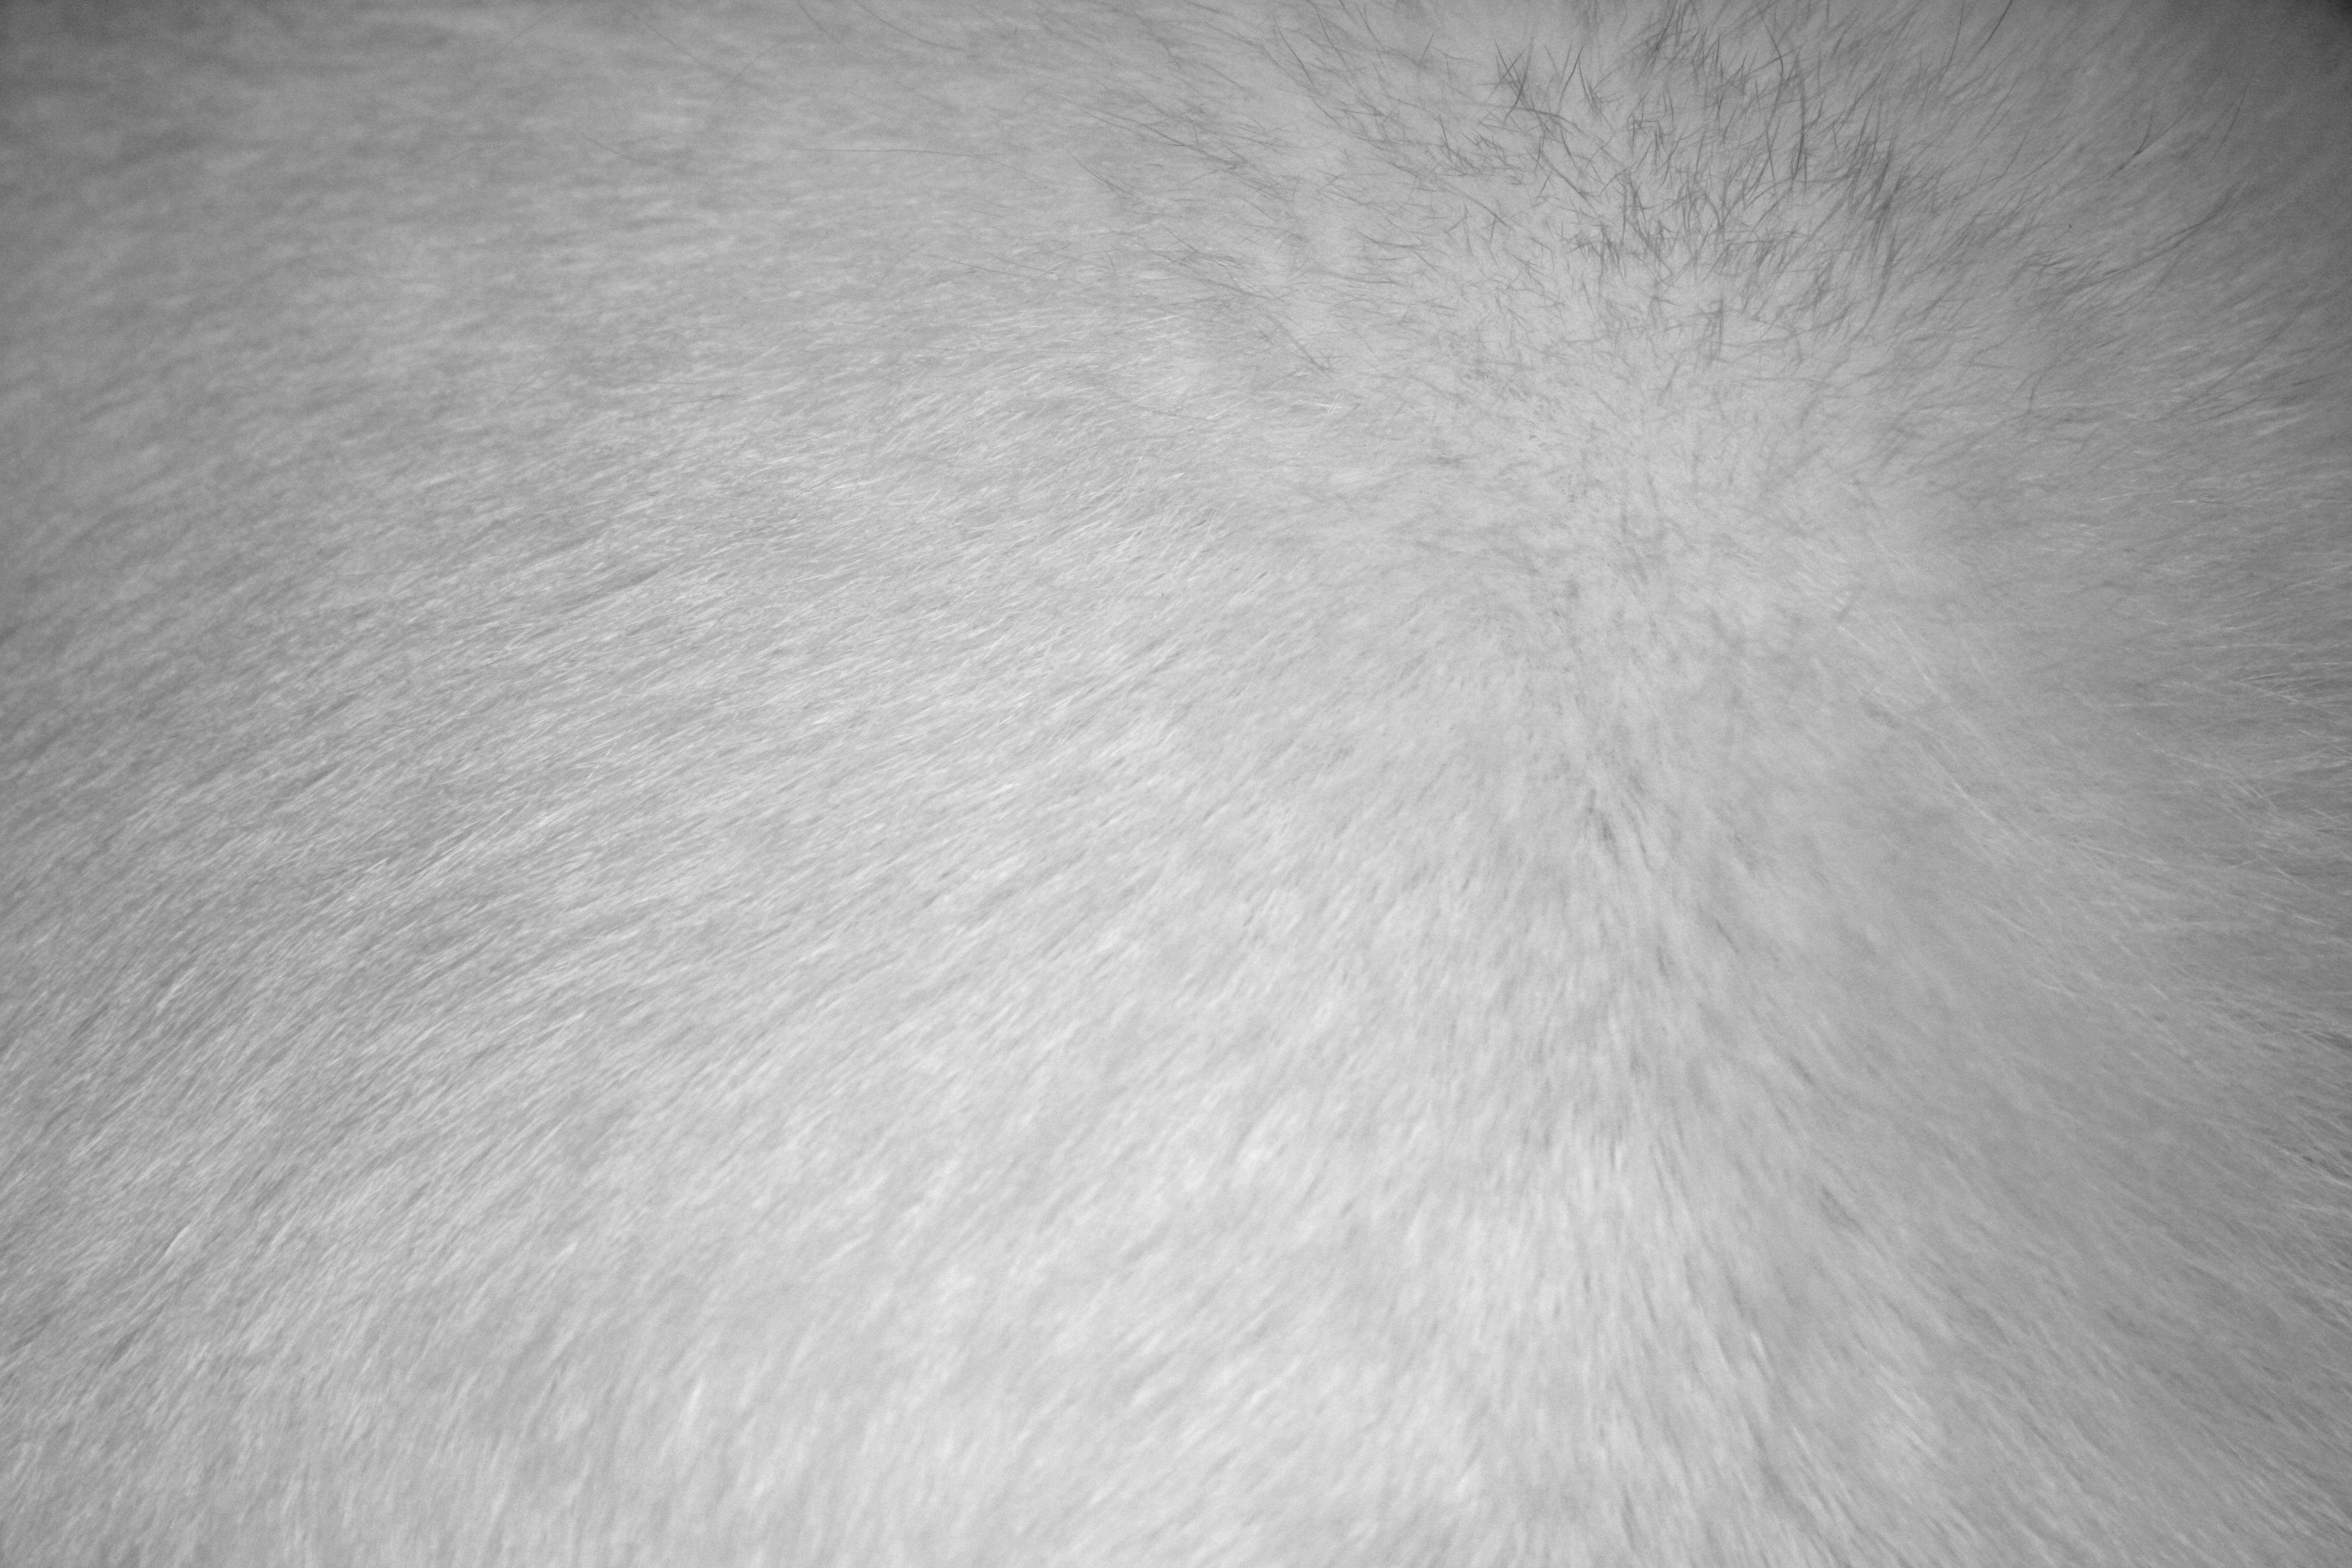 white fur texture � photos public domain